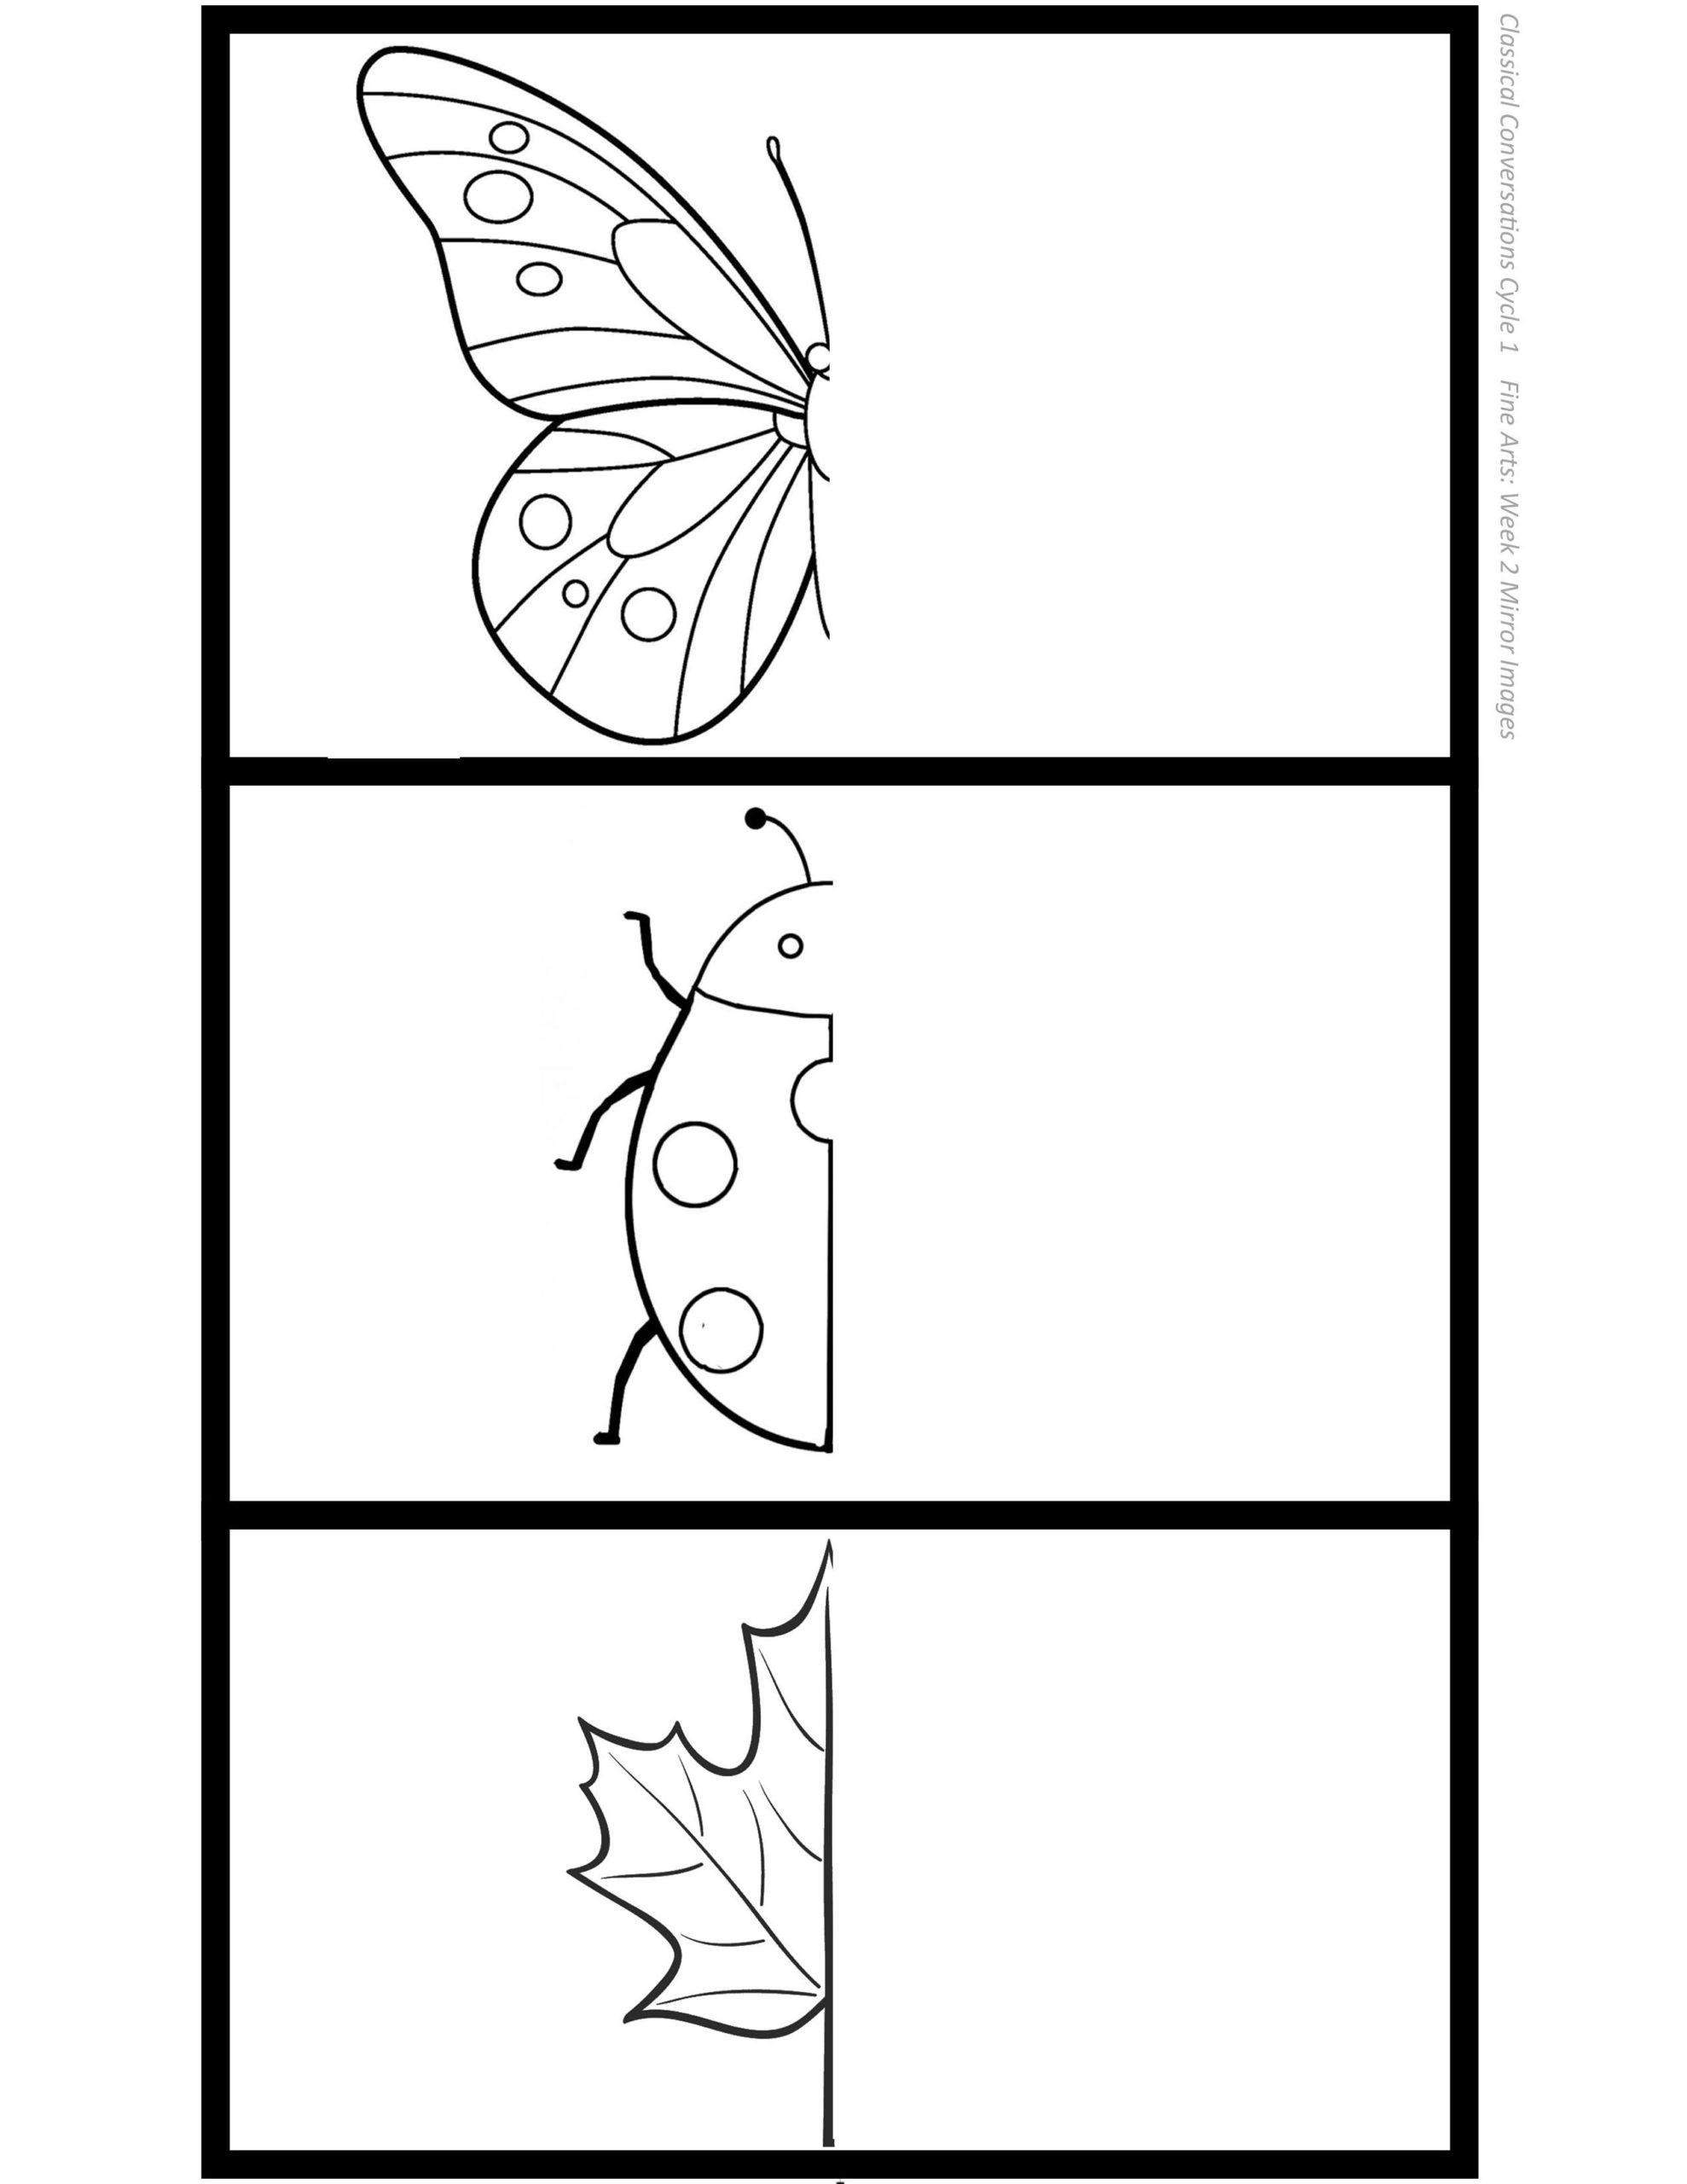 Butterfly Worksheets For Kindergarten In